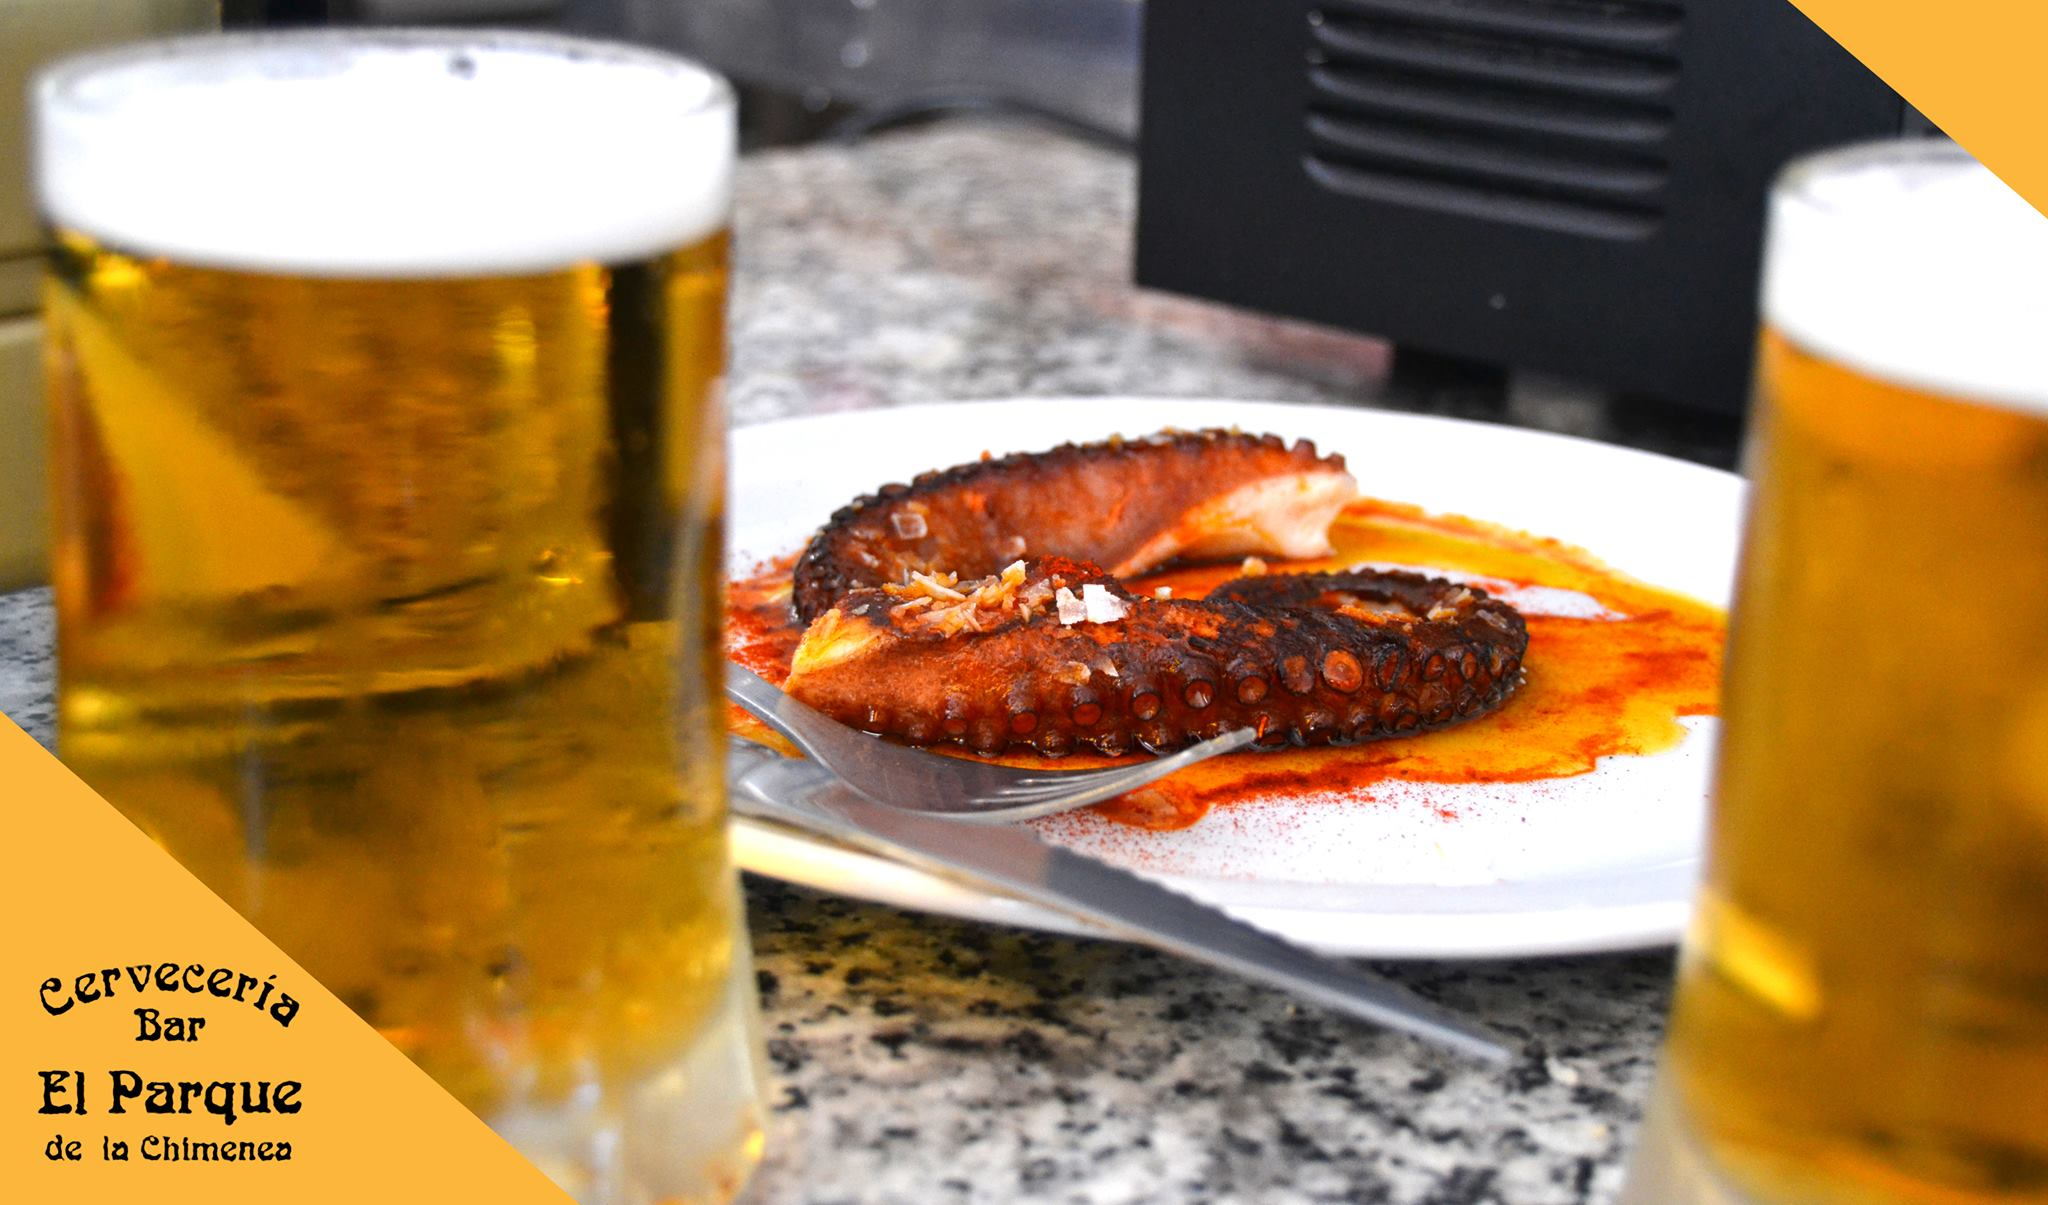 Cerveceria Bar El Parque de la Chimenea